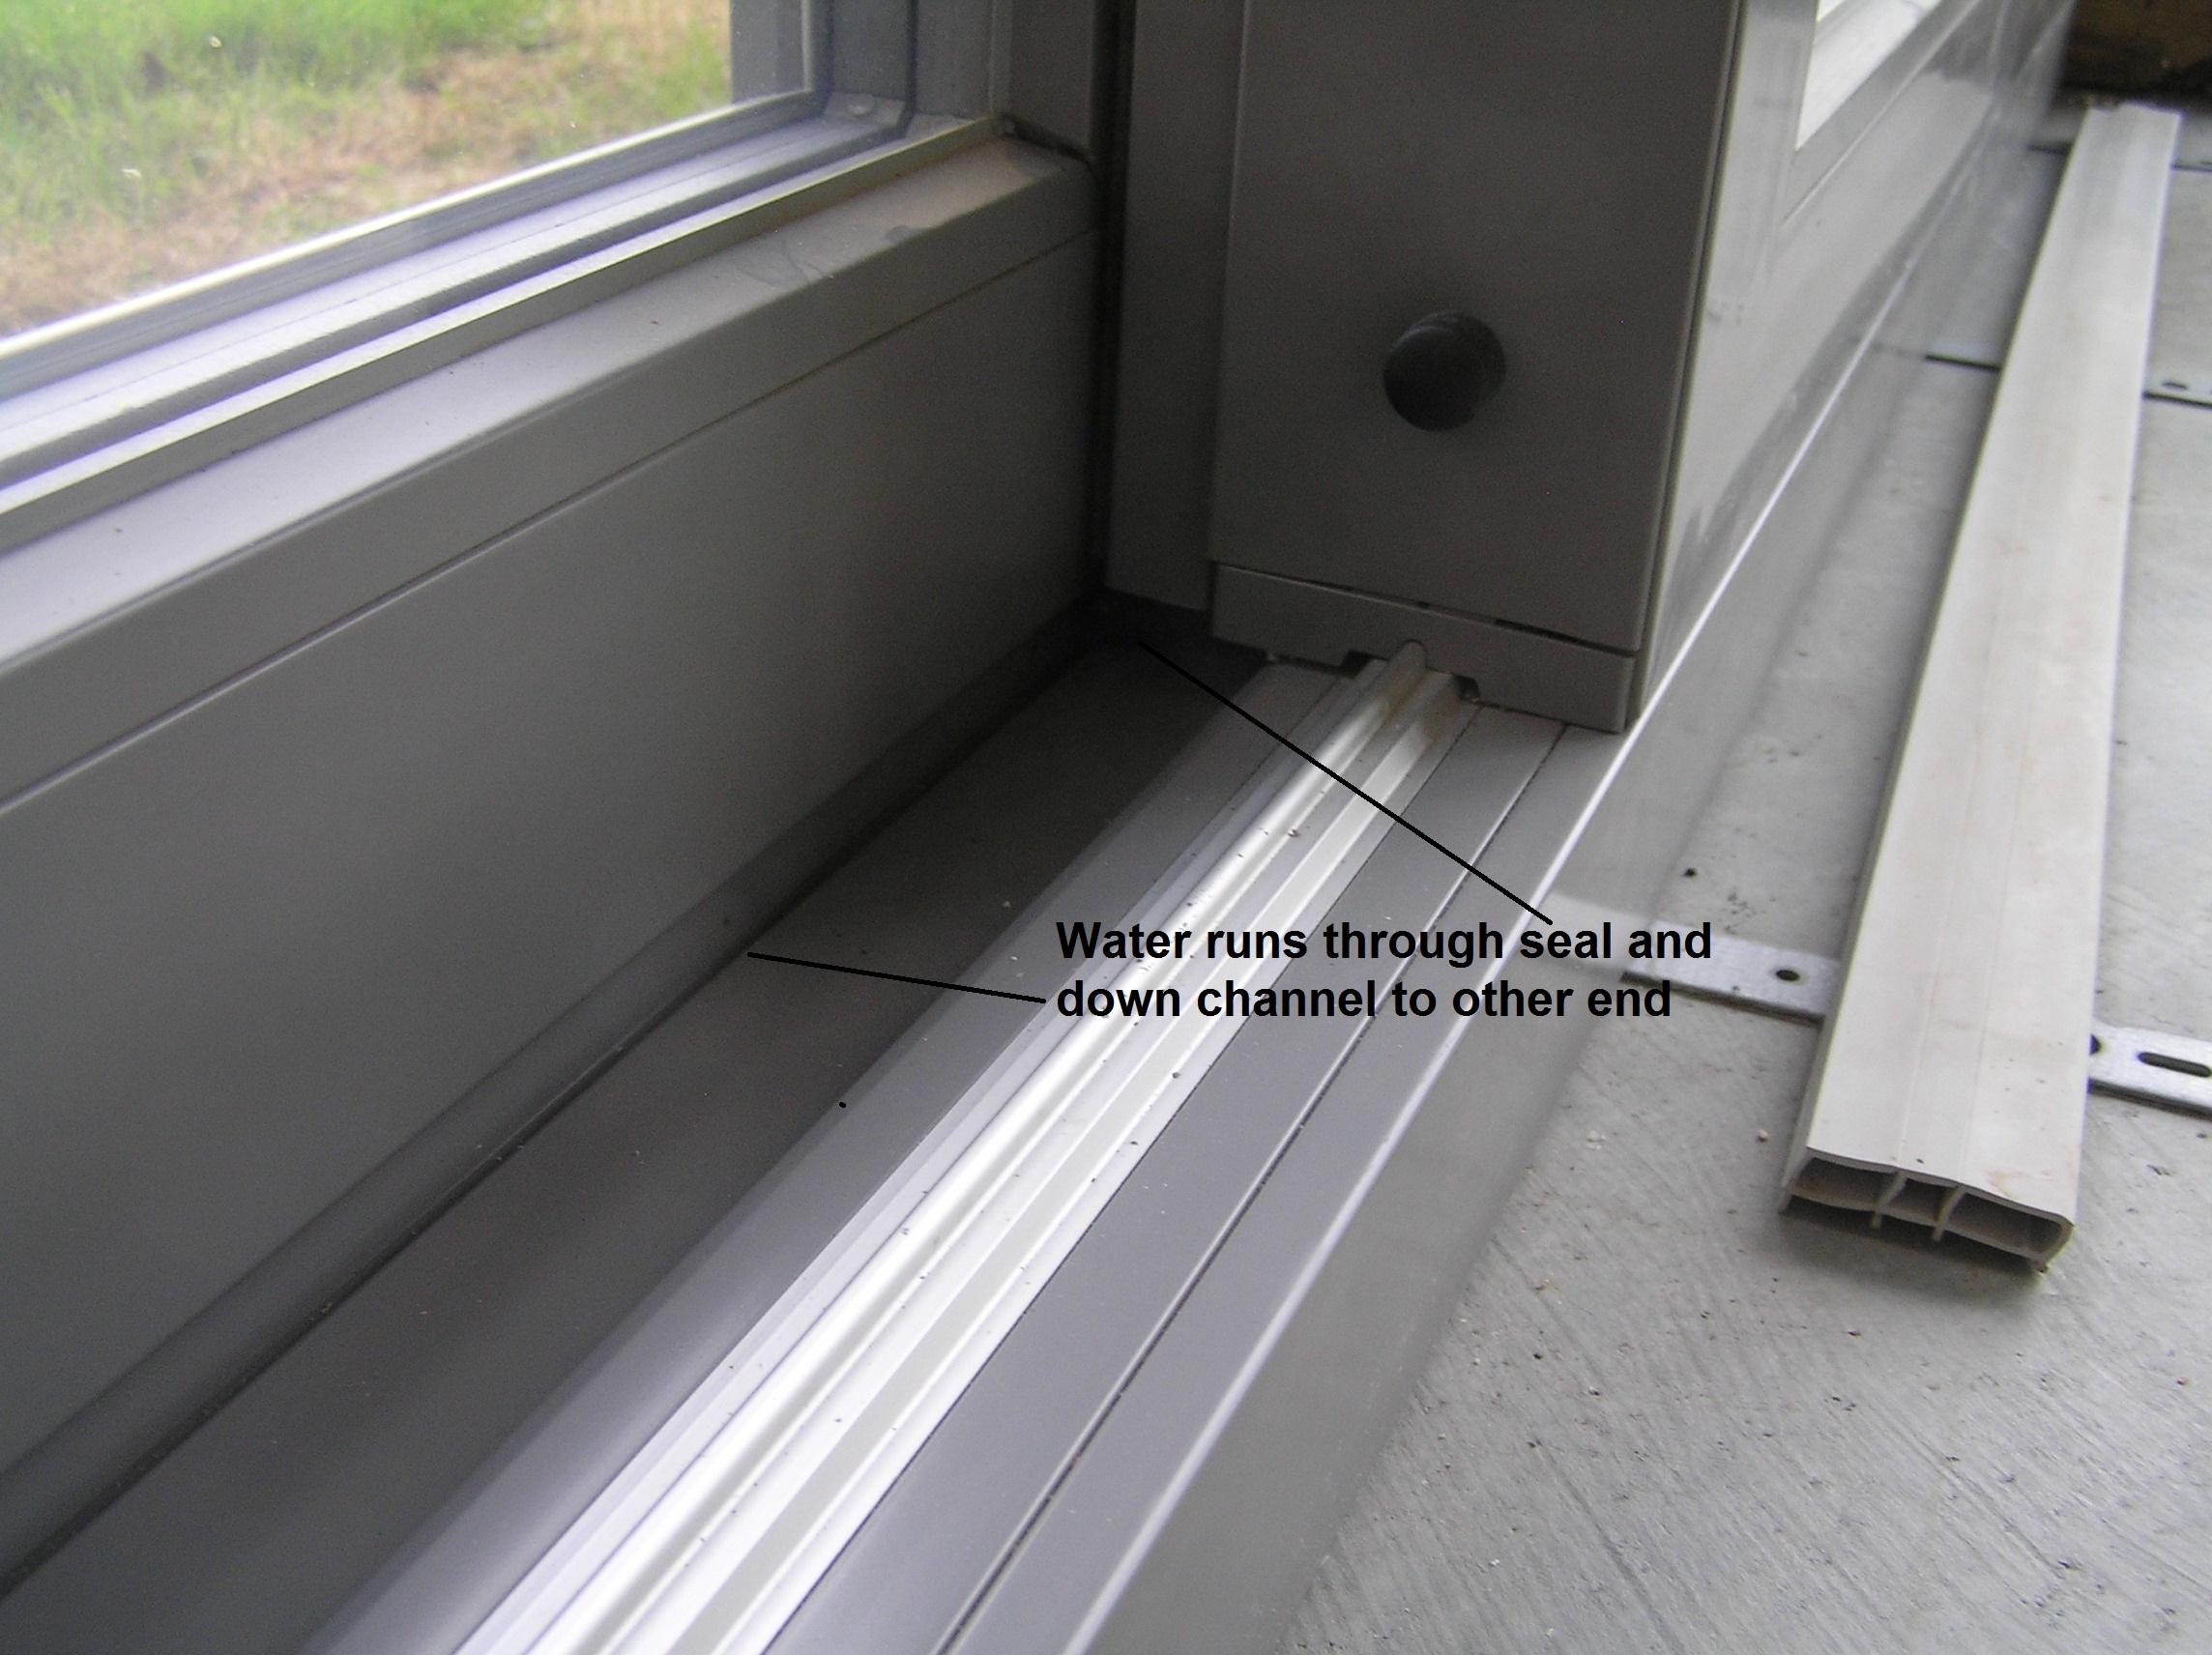 Internorm Forum Of Internorm Sliders Leaking Windows Glazing Buildhub